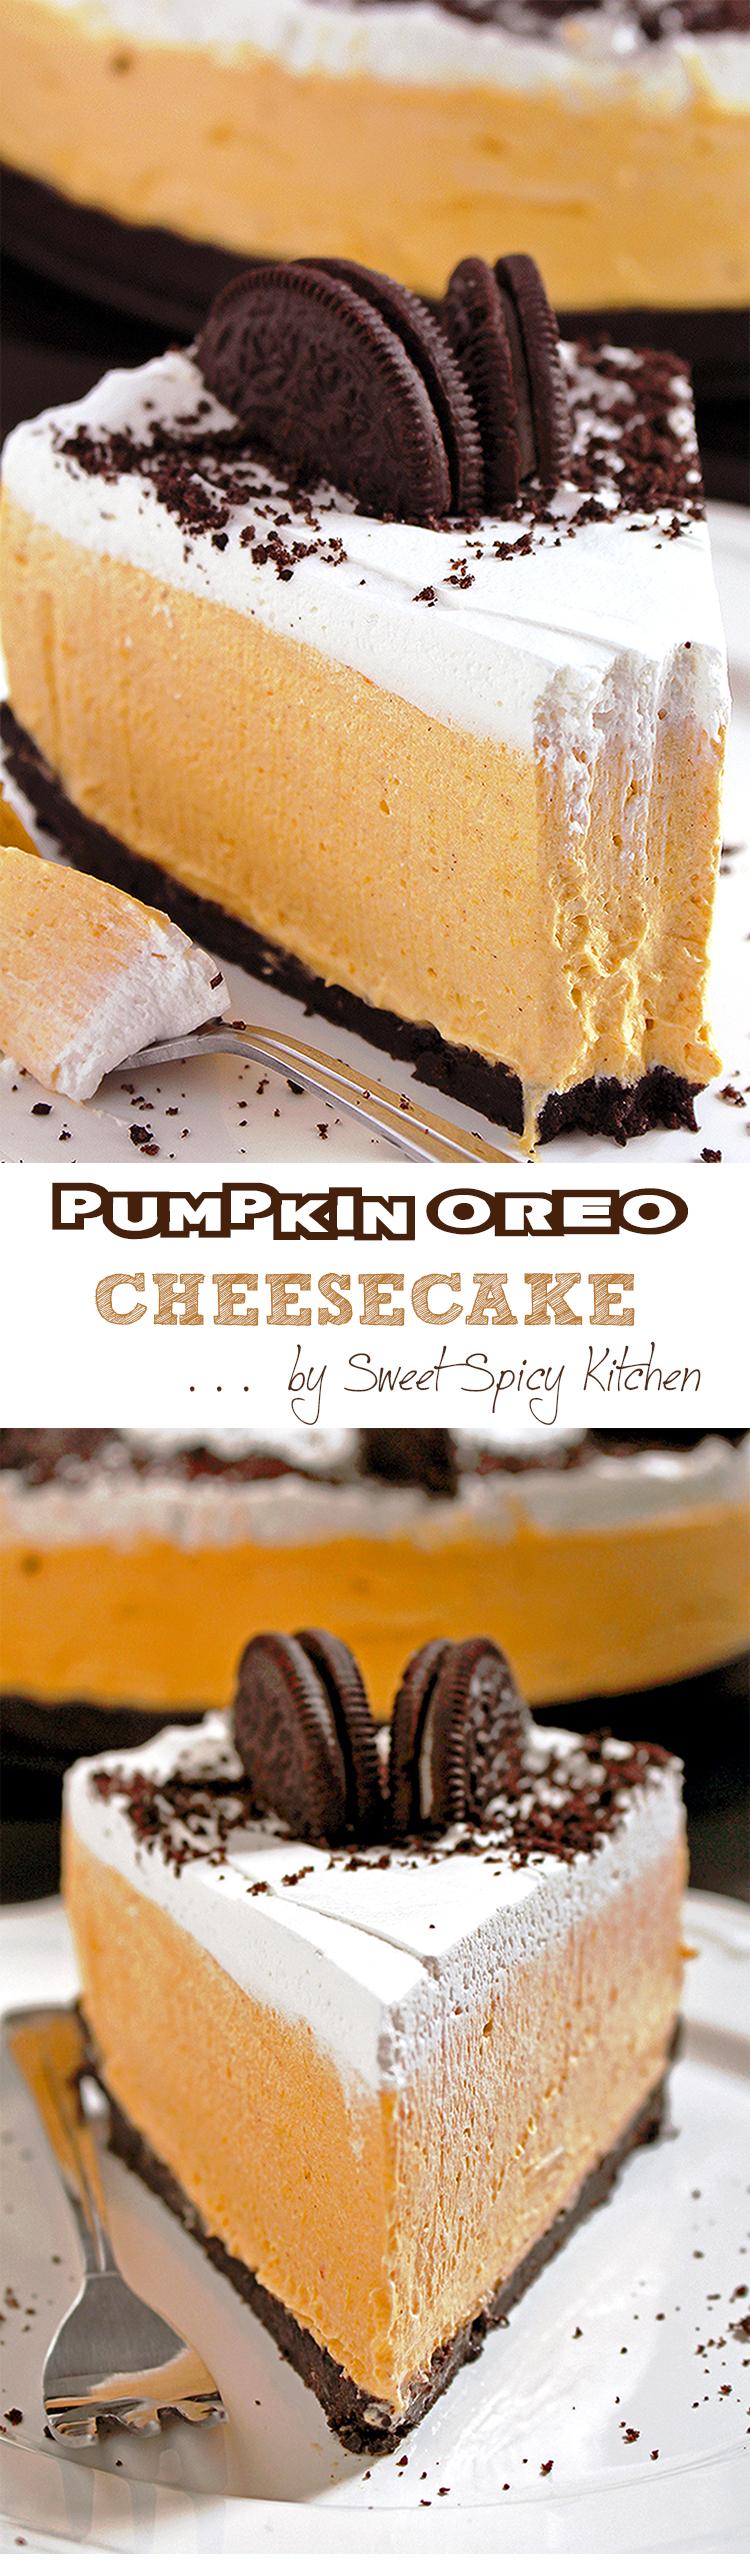 Untitled-192 No Bake Pumpkin Oreo Cheesecake